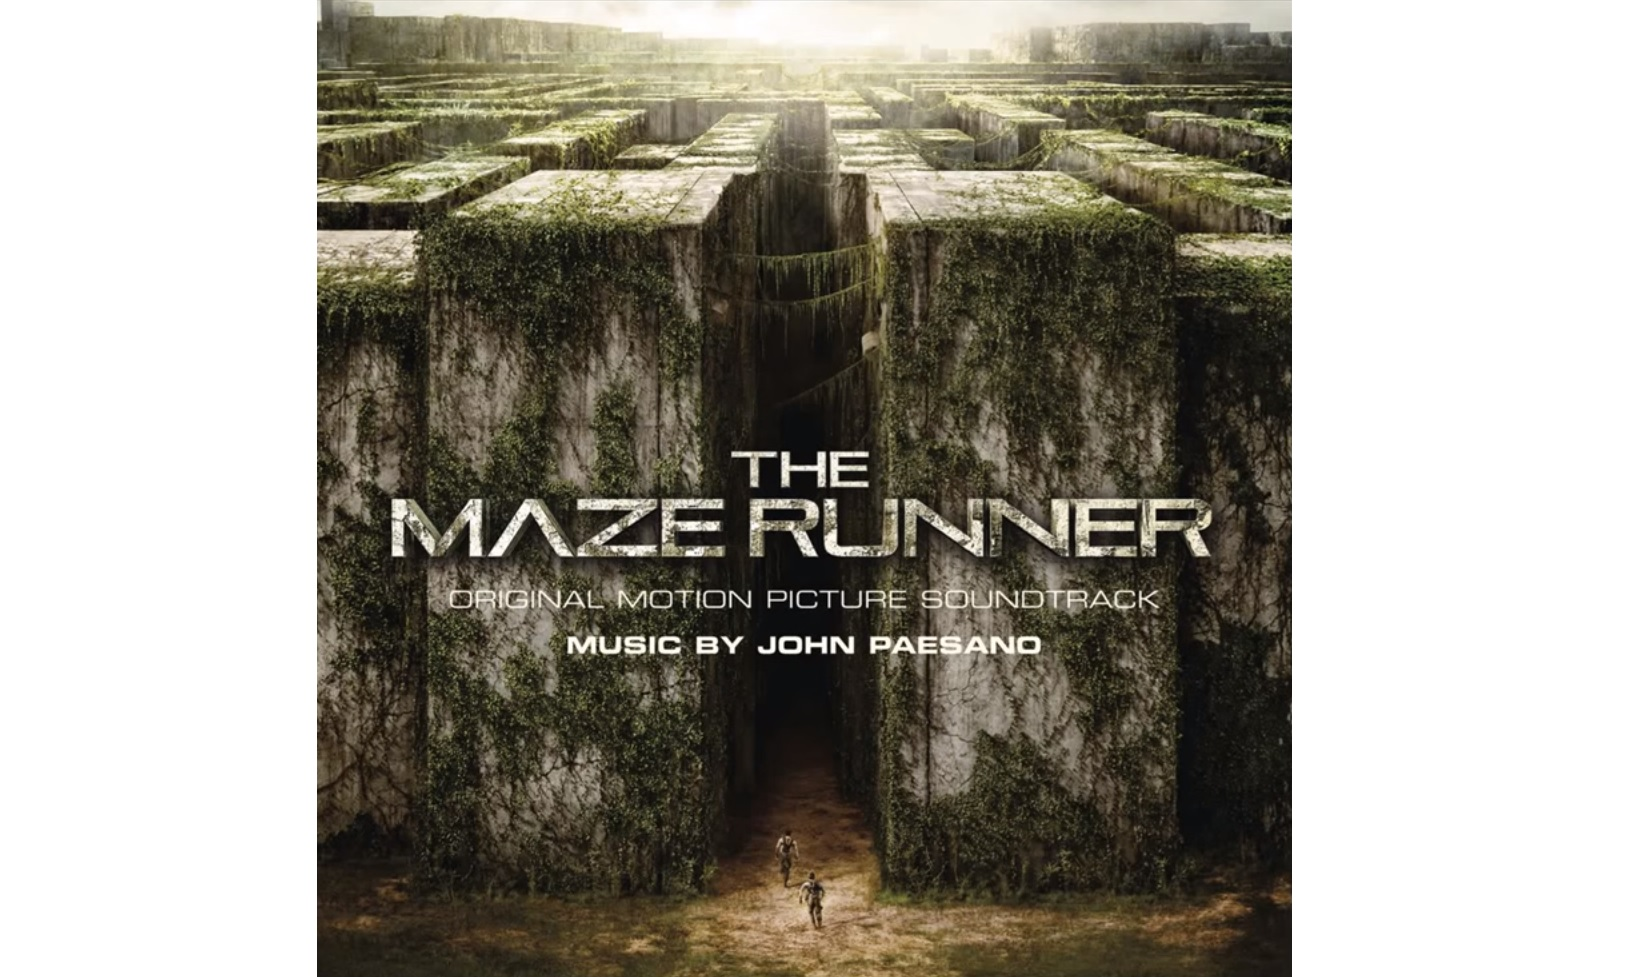 Maze Runner (Filmes del 2014 y 2015) – Soundtrack